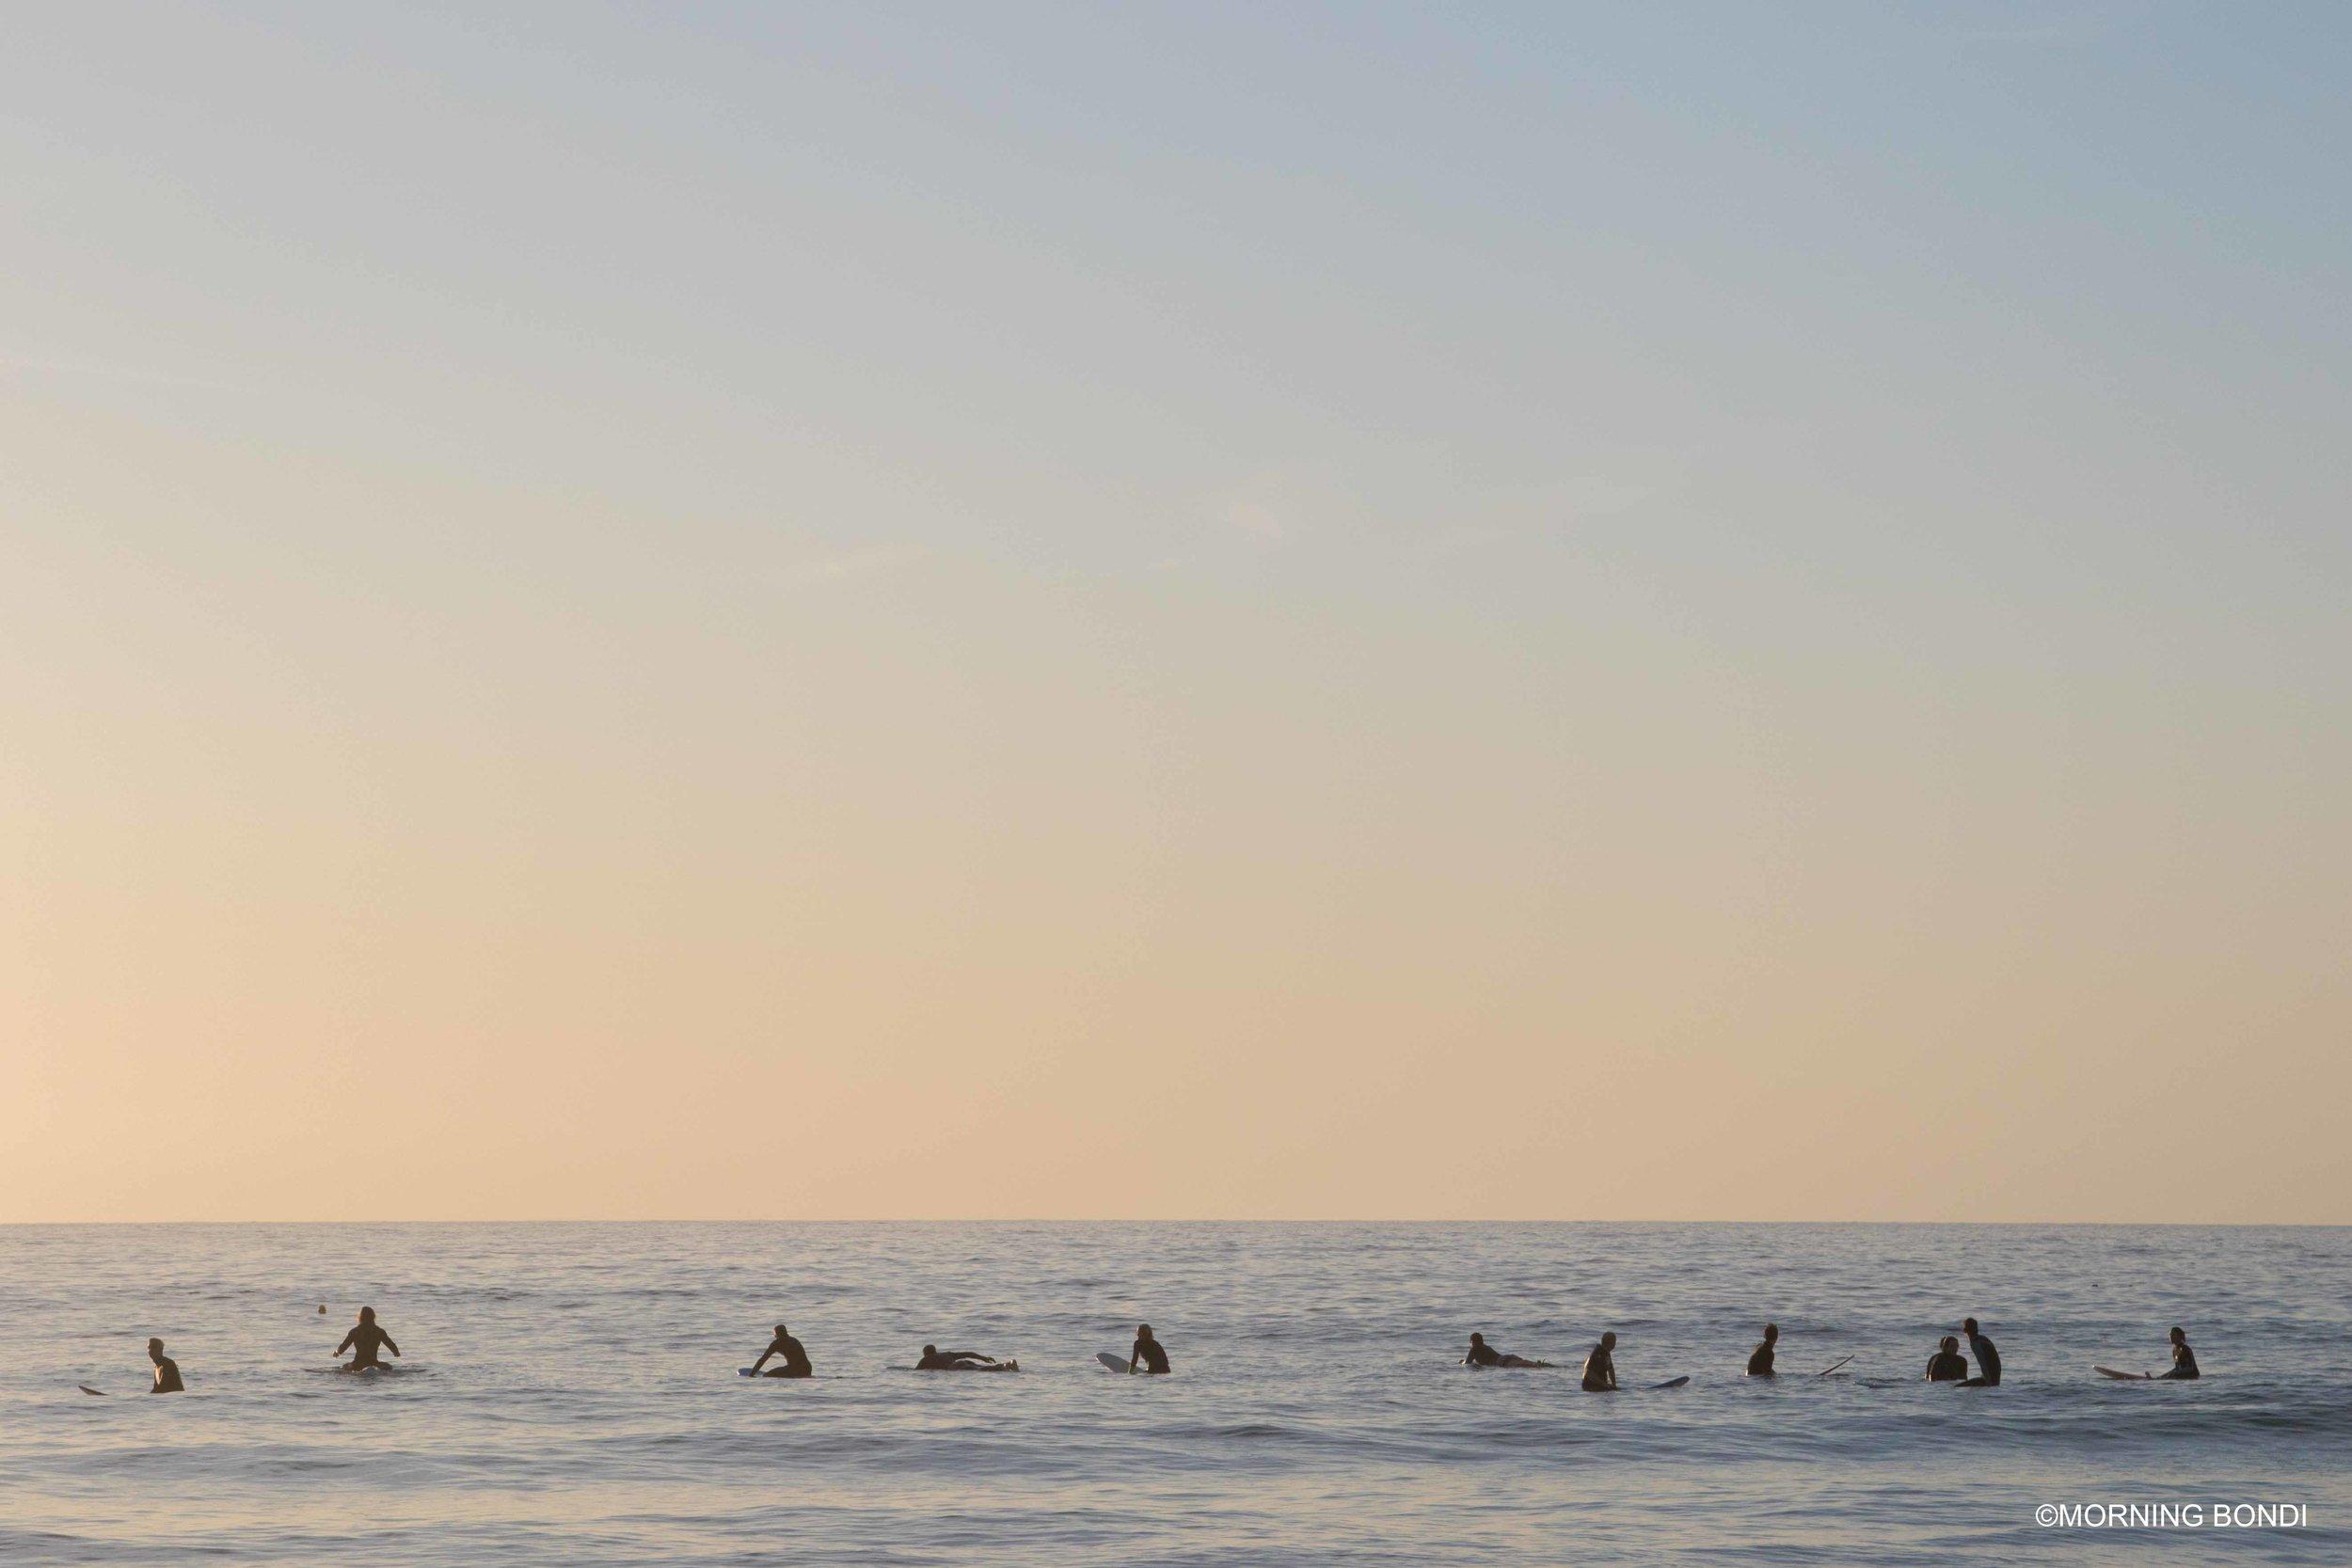 Sunrise surf at its best